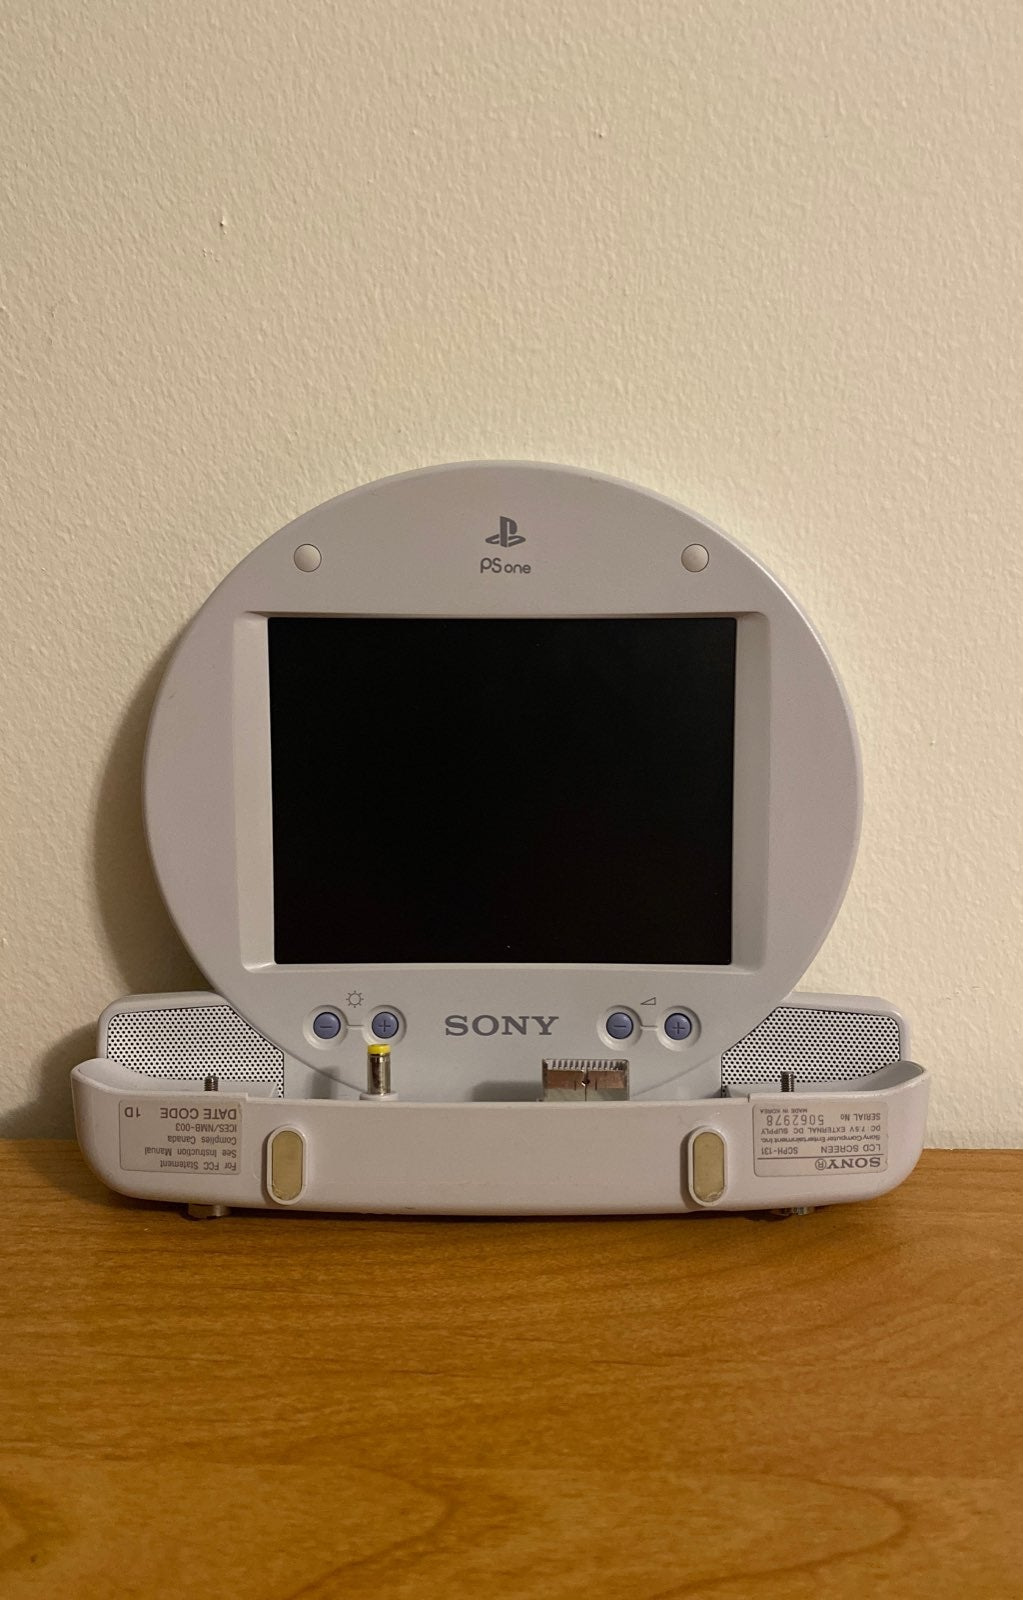 Sony Psone LCD Screen (SCPH-131)